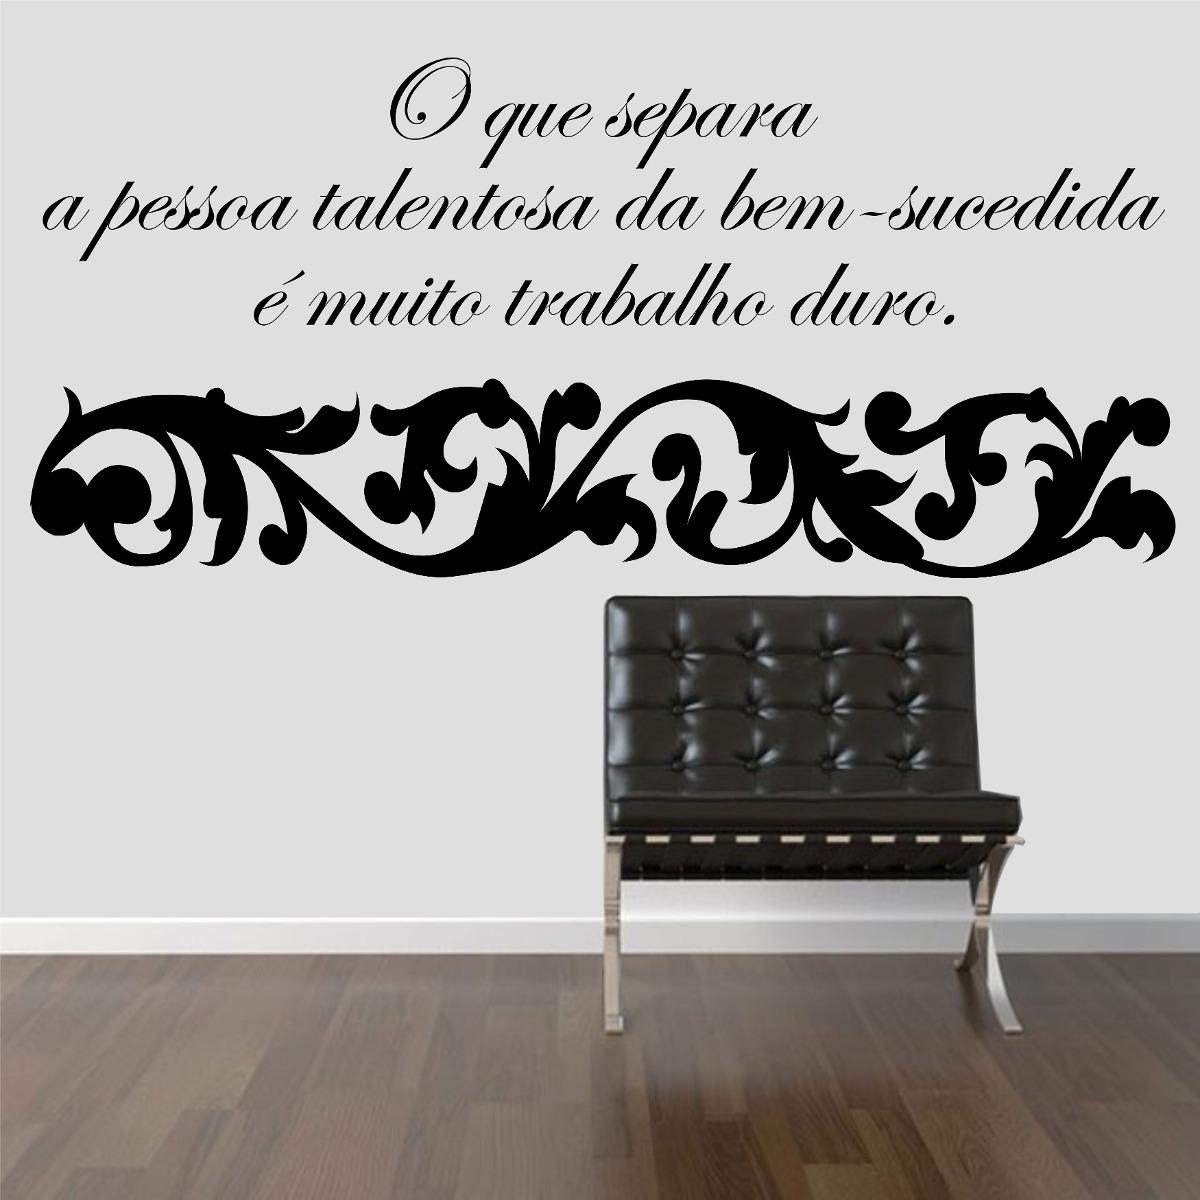 Decorativo Para Parede Adesivo Decorativo Adesivo De Parede Painel  -> Adesivos Decorativos Para Sala De Jantar